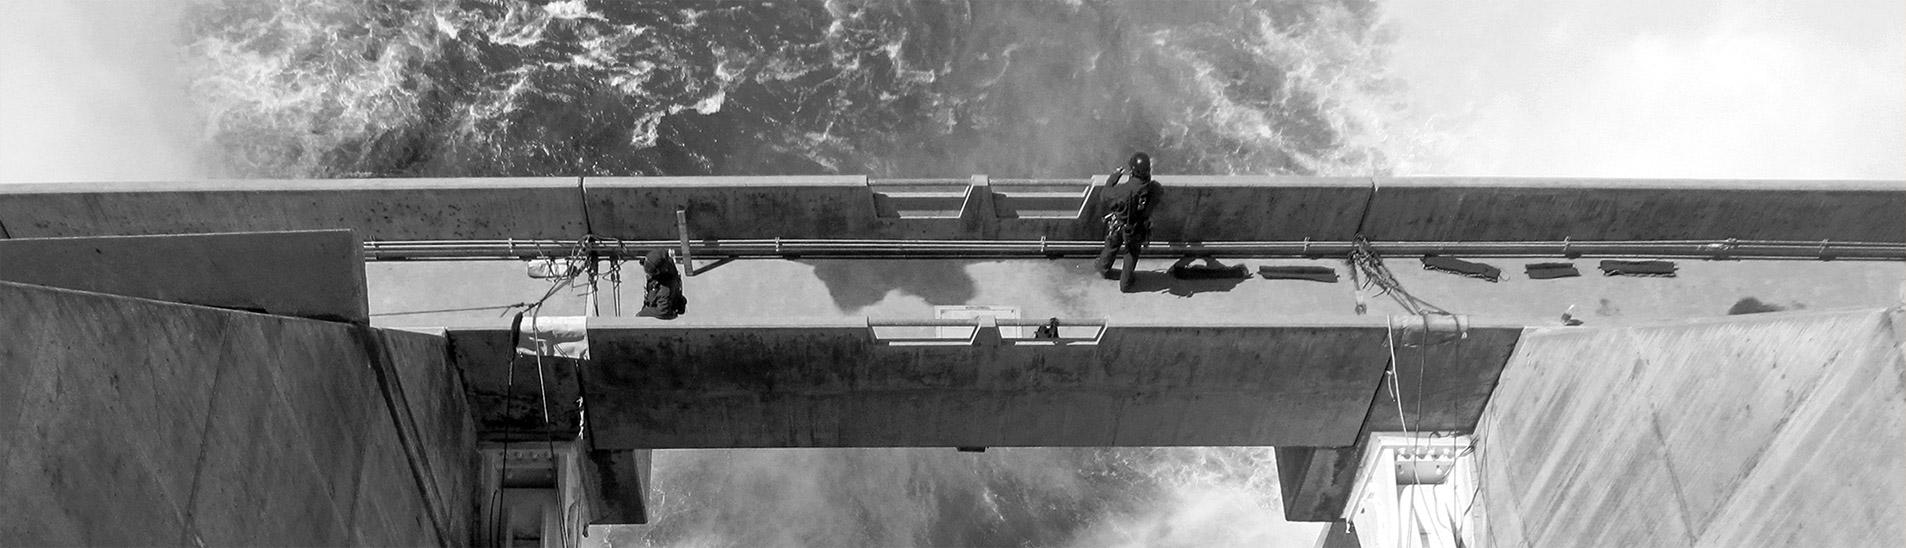 man on dam bridge